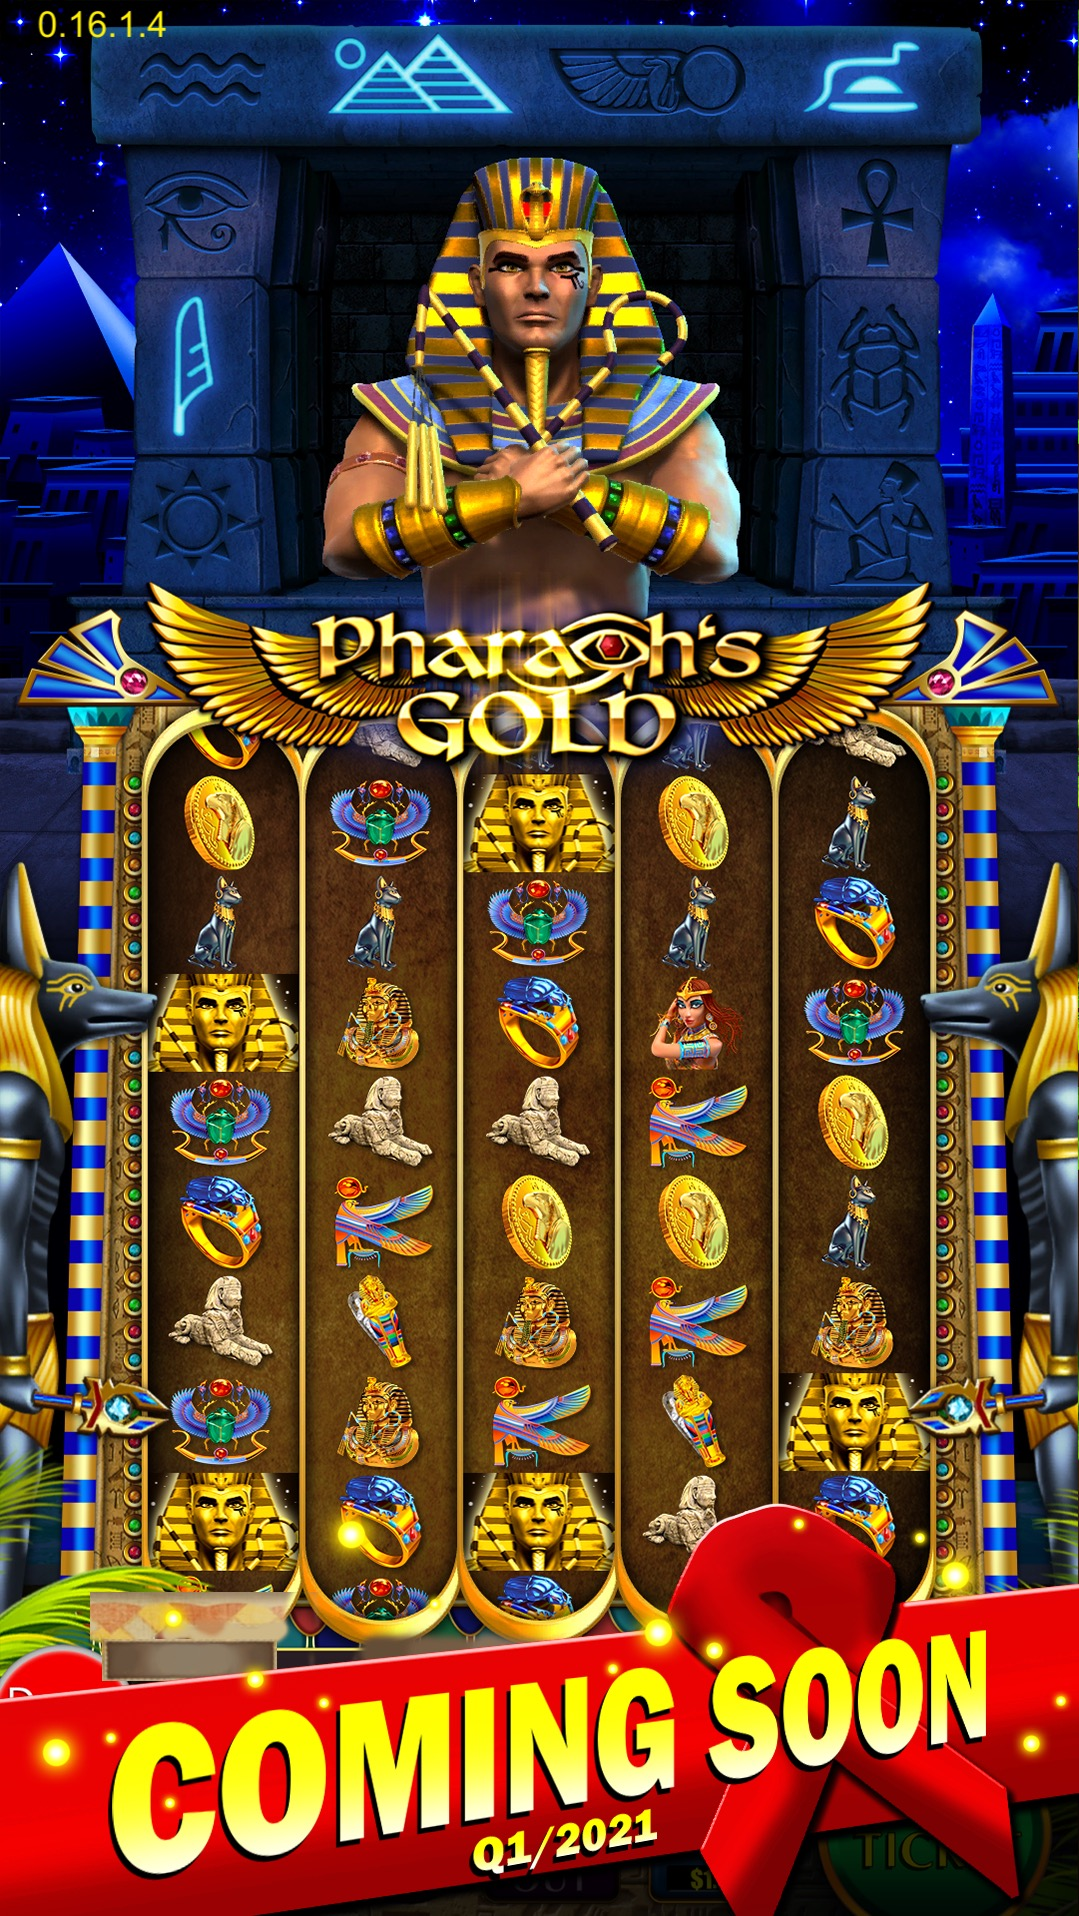 Pharaohs Gold Pull Tab Game